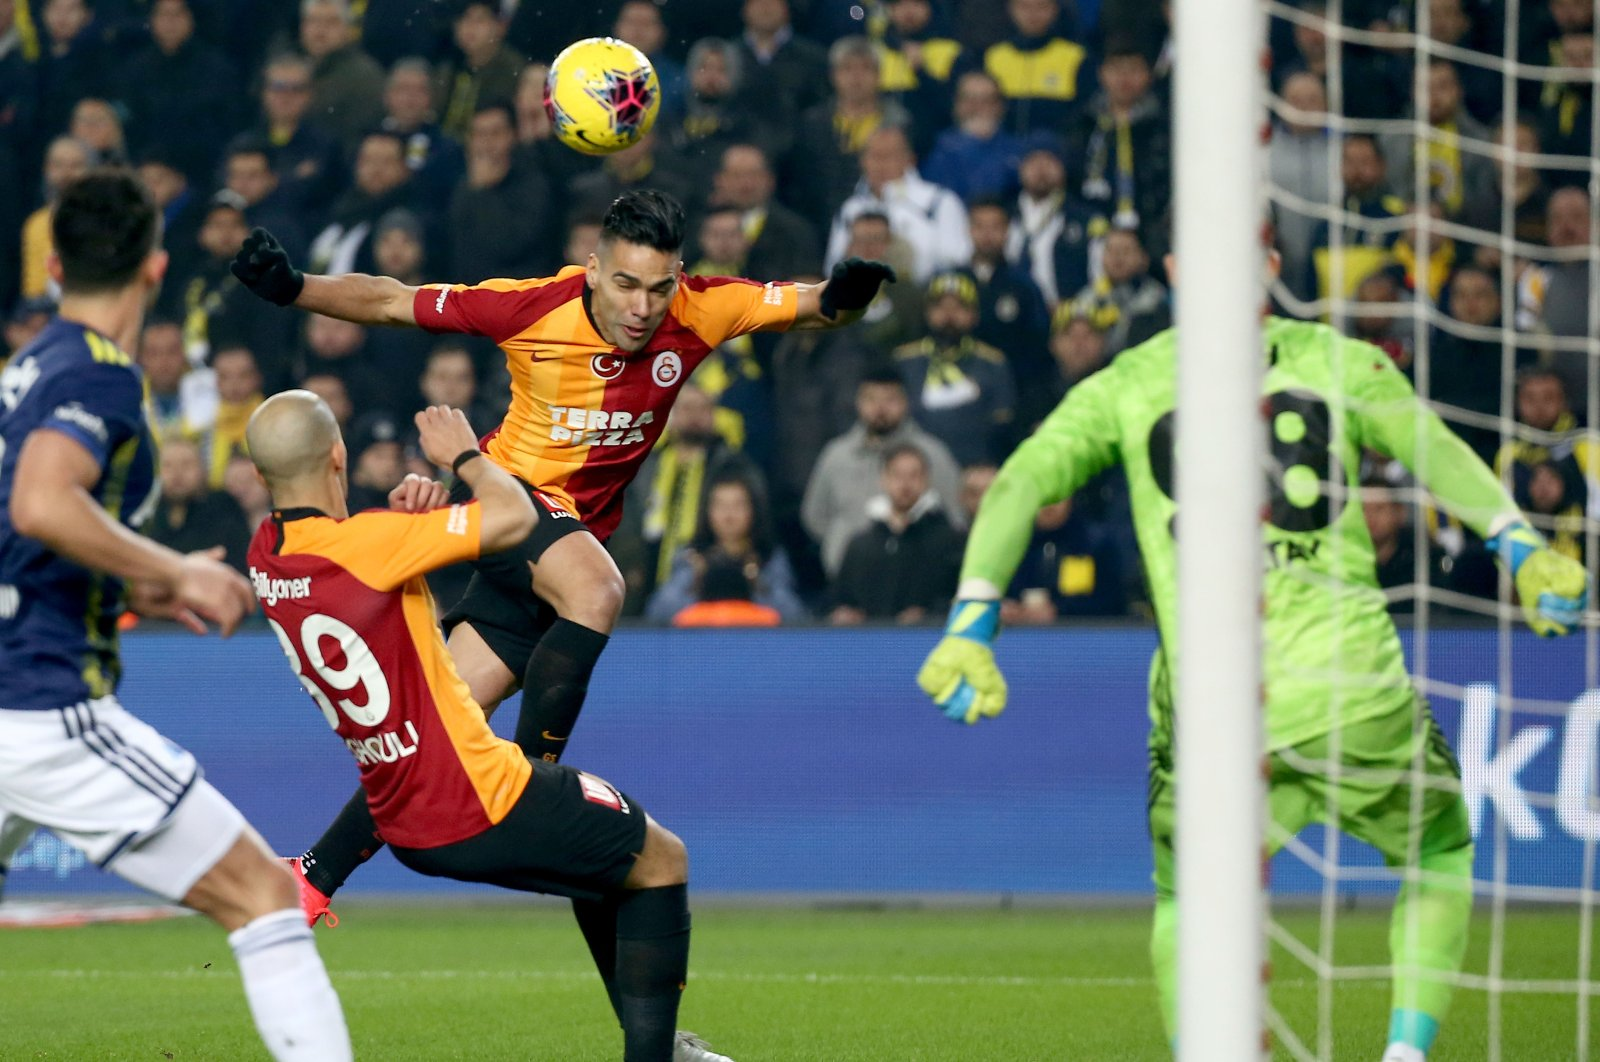 Galatasaray's Radamel Falcao (C) goes for a header during a Süper Lig derby match against Fenerbahçe, in Istanbul, Turkey, Feb. 23, 2020. (AA Photo)